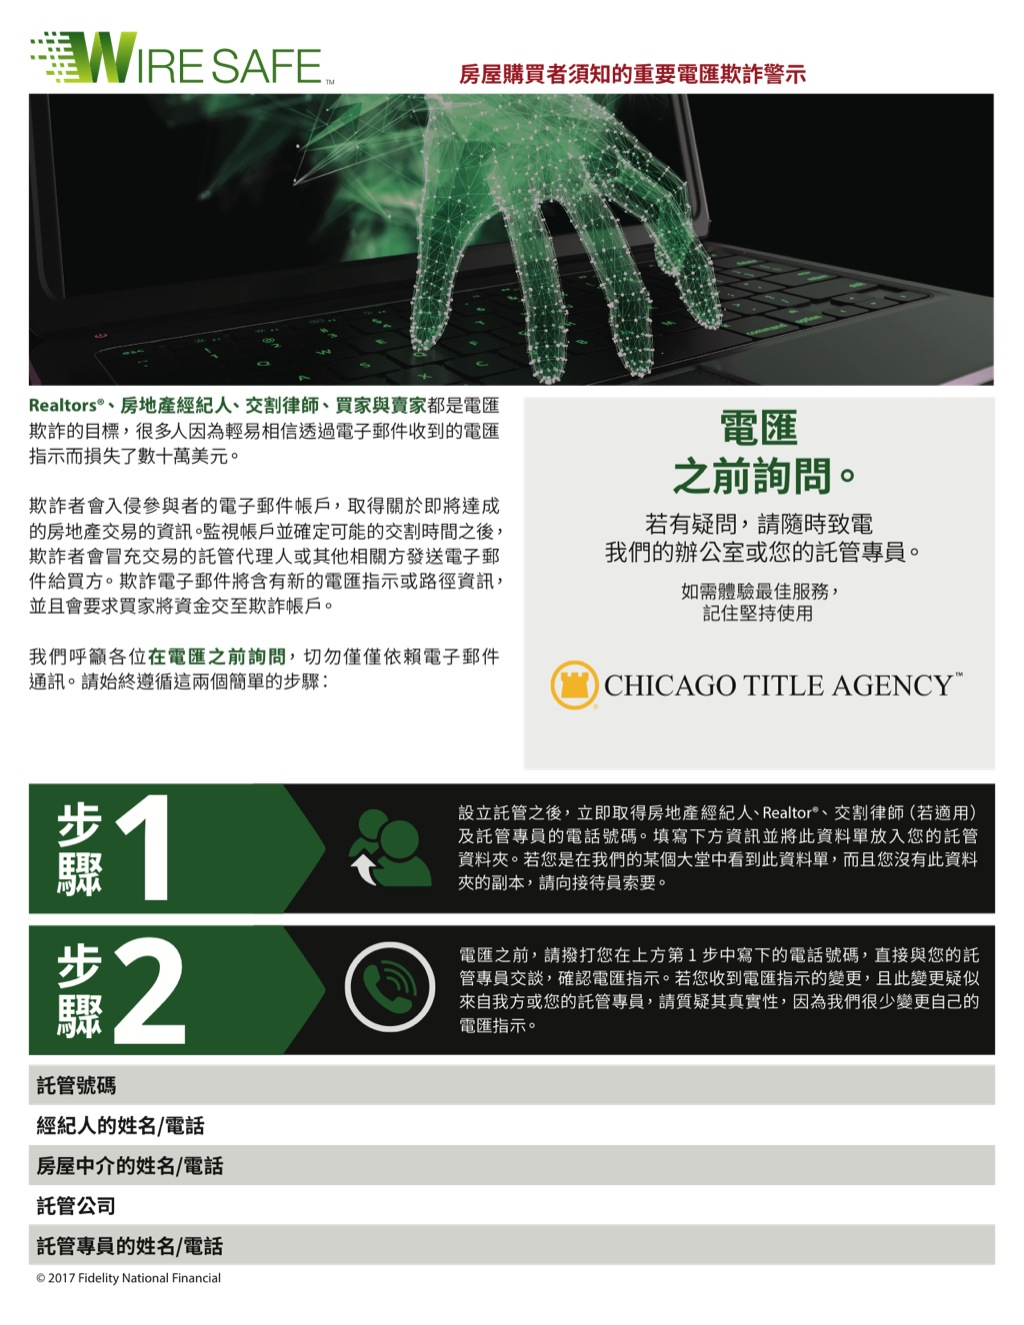 Corefact Wire Safe Buyer Flyer - Cantonese - CTA